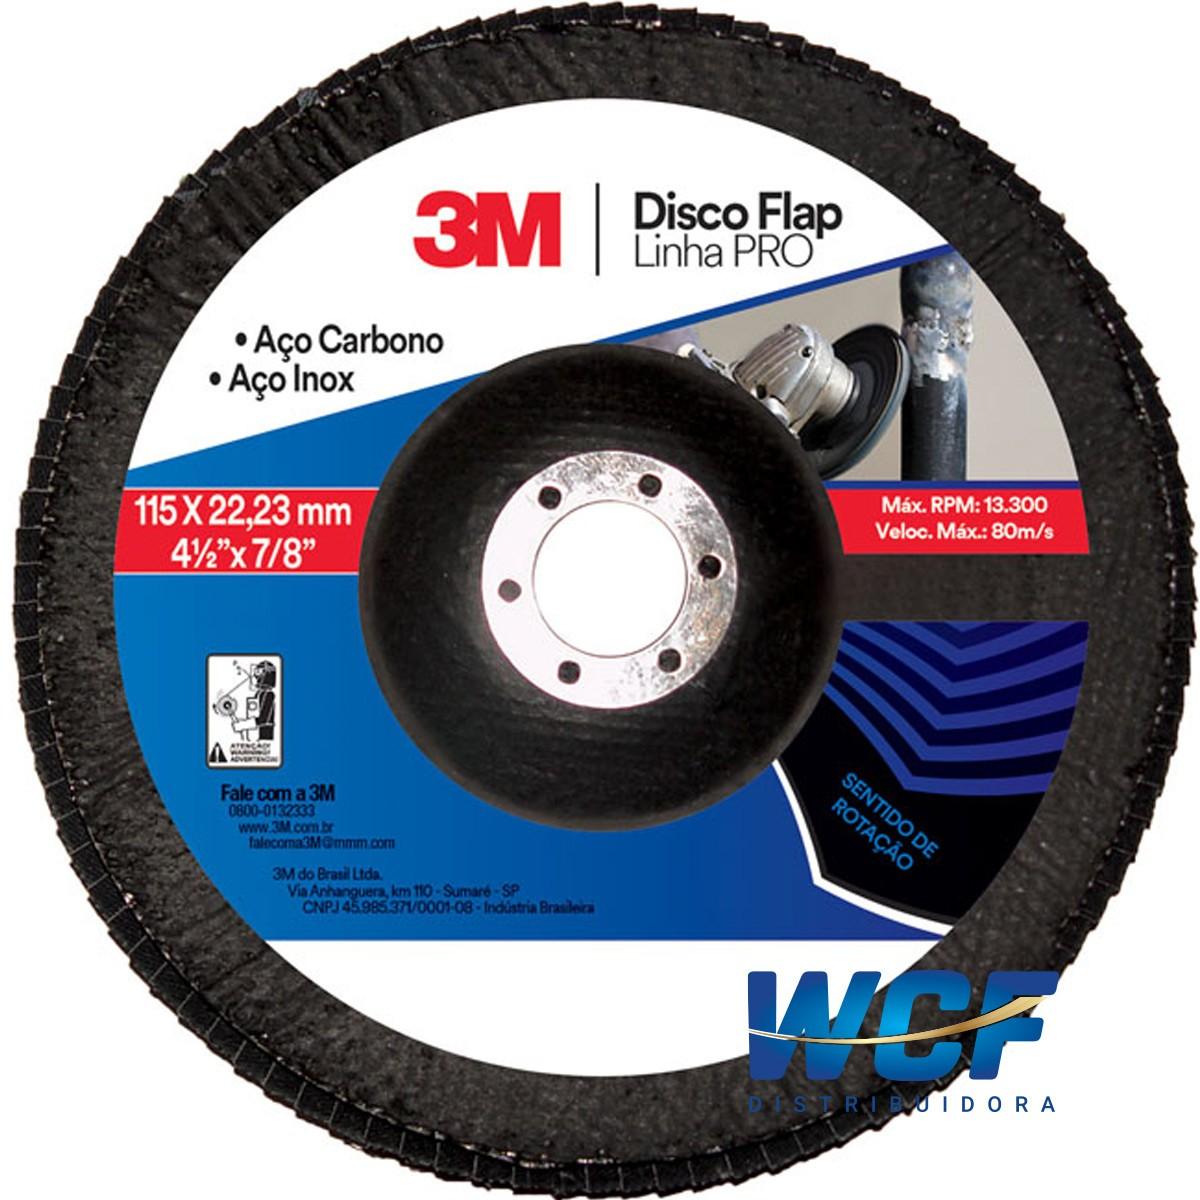 3M DISCO FLAP DISC 60